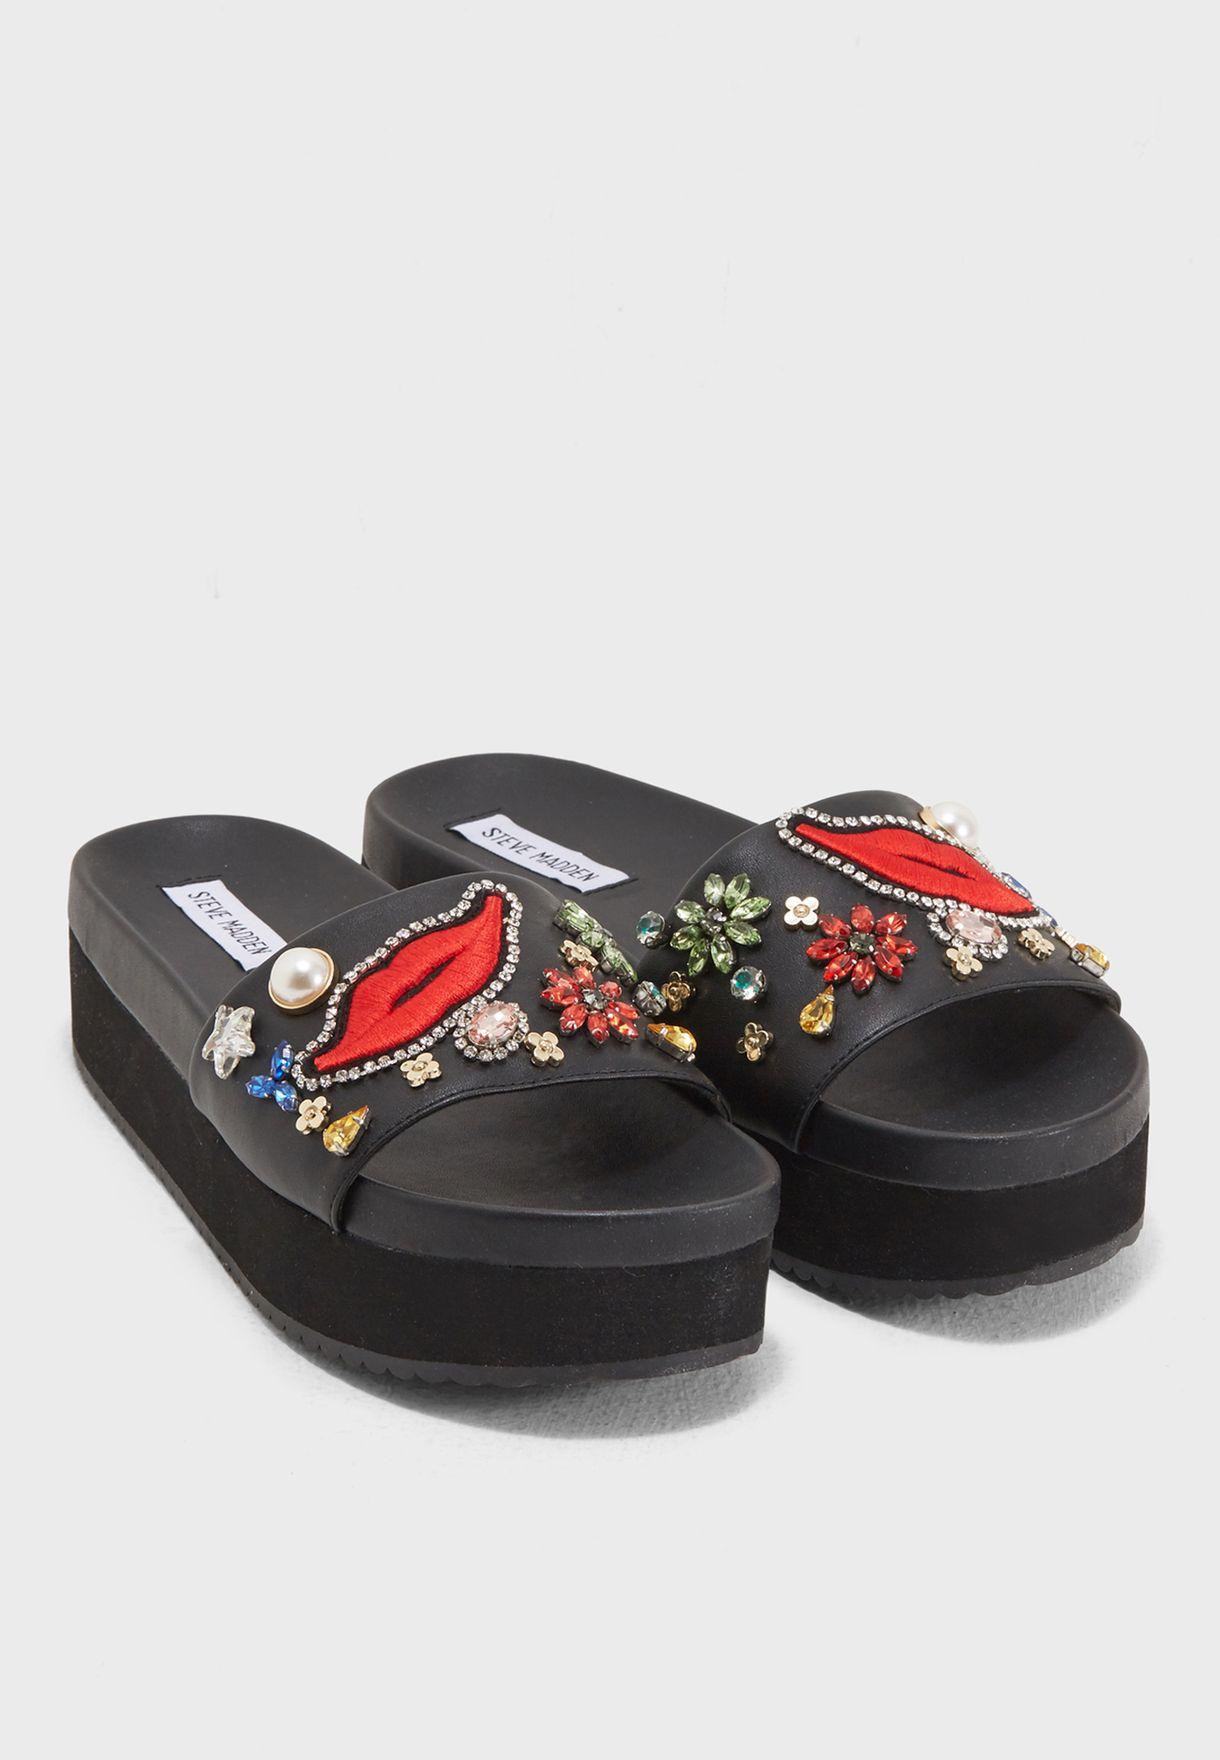 28bfa24a3f0 Shop Steve Madden black Adorn Flat Sandals ADORN for Women in Oman ...